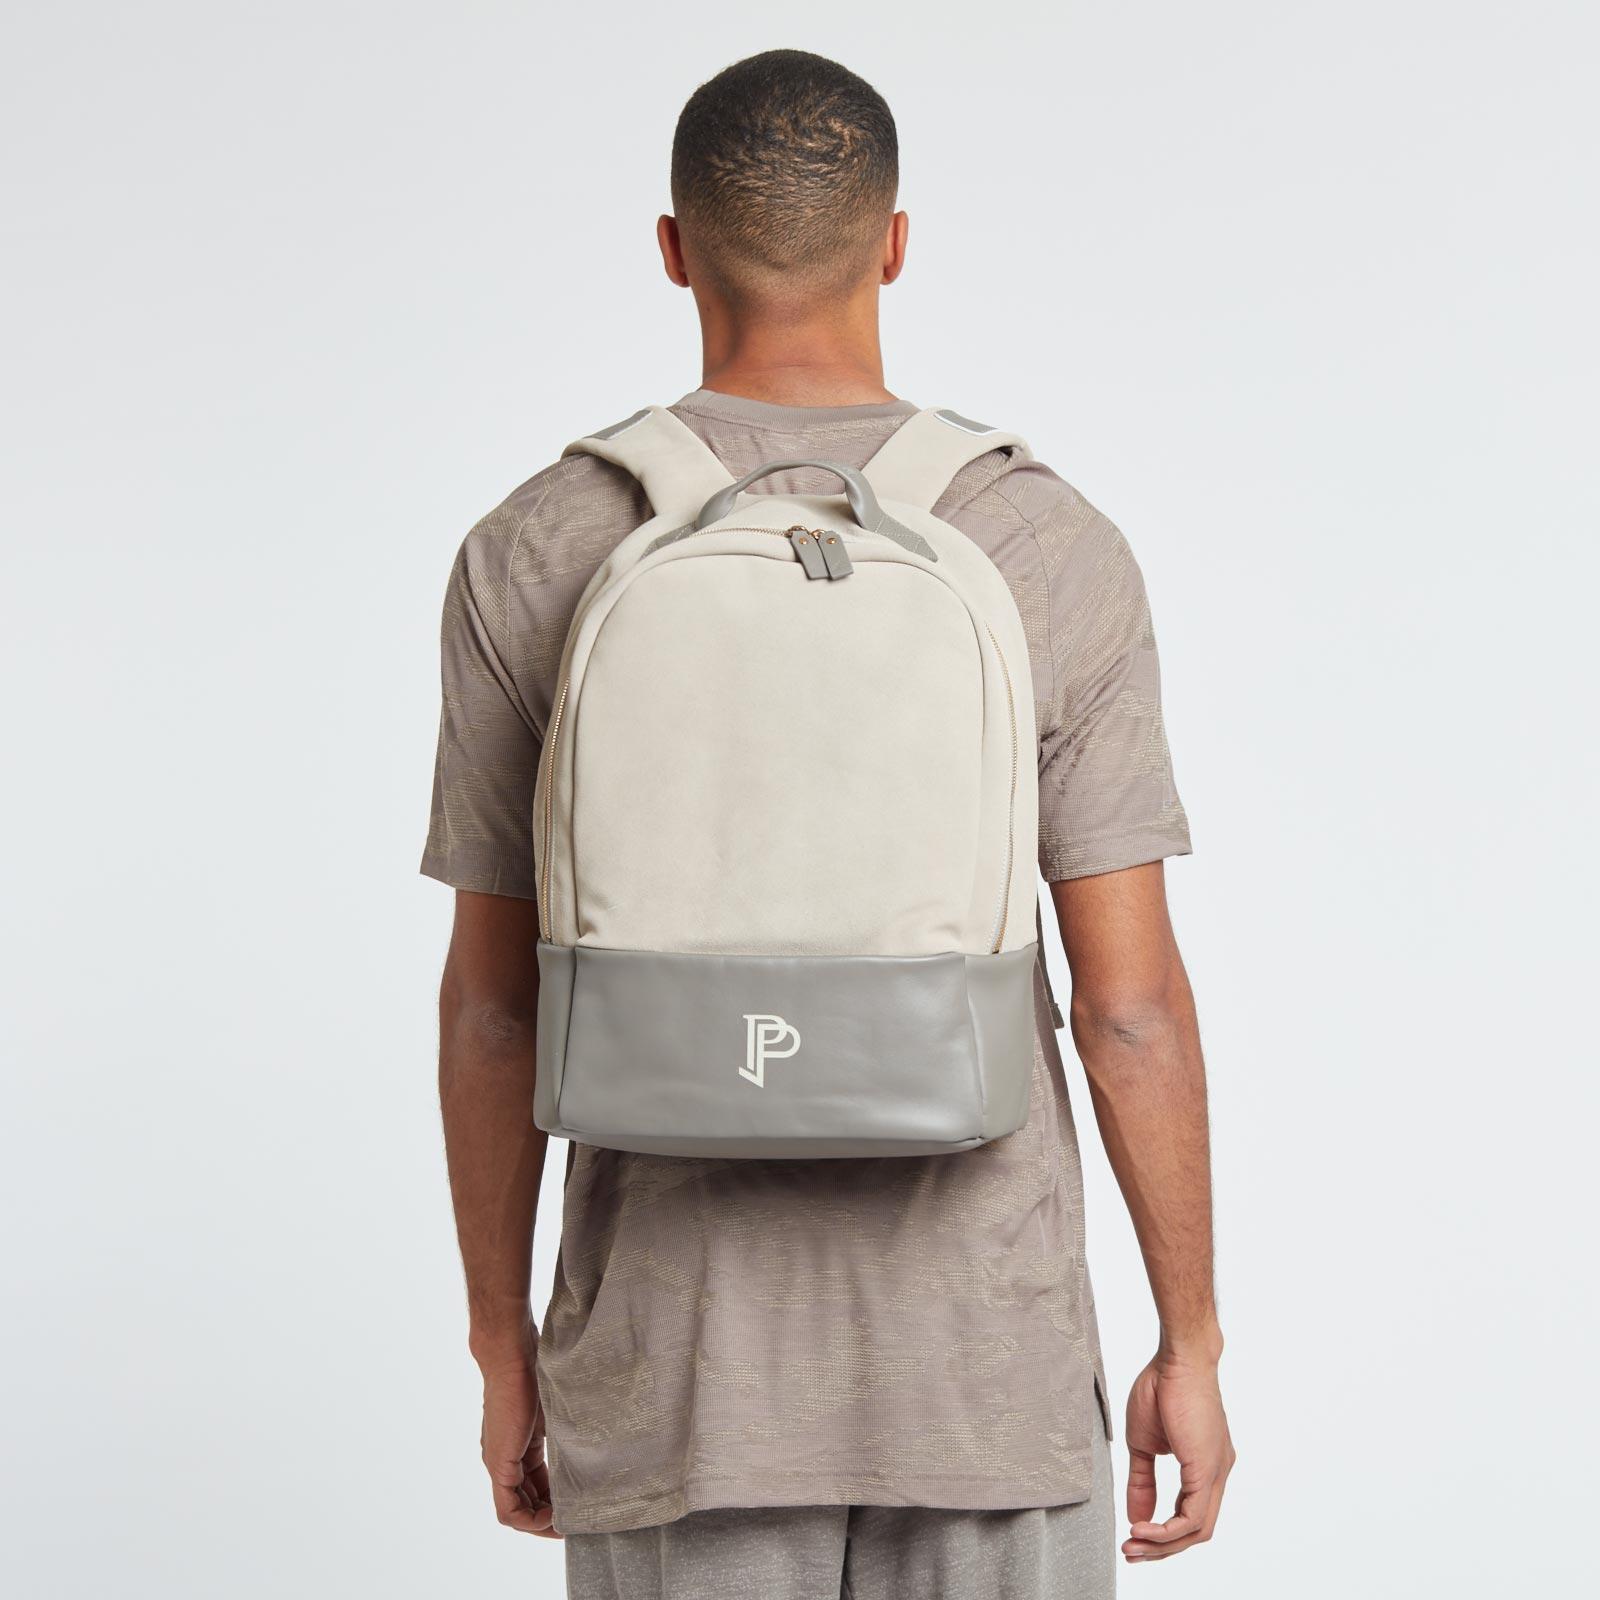 aee377d75386 adidas paul pogba travel bag - cd6798 - sneakersnstuff